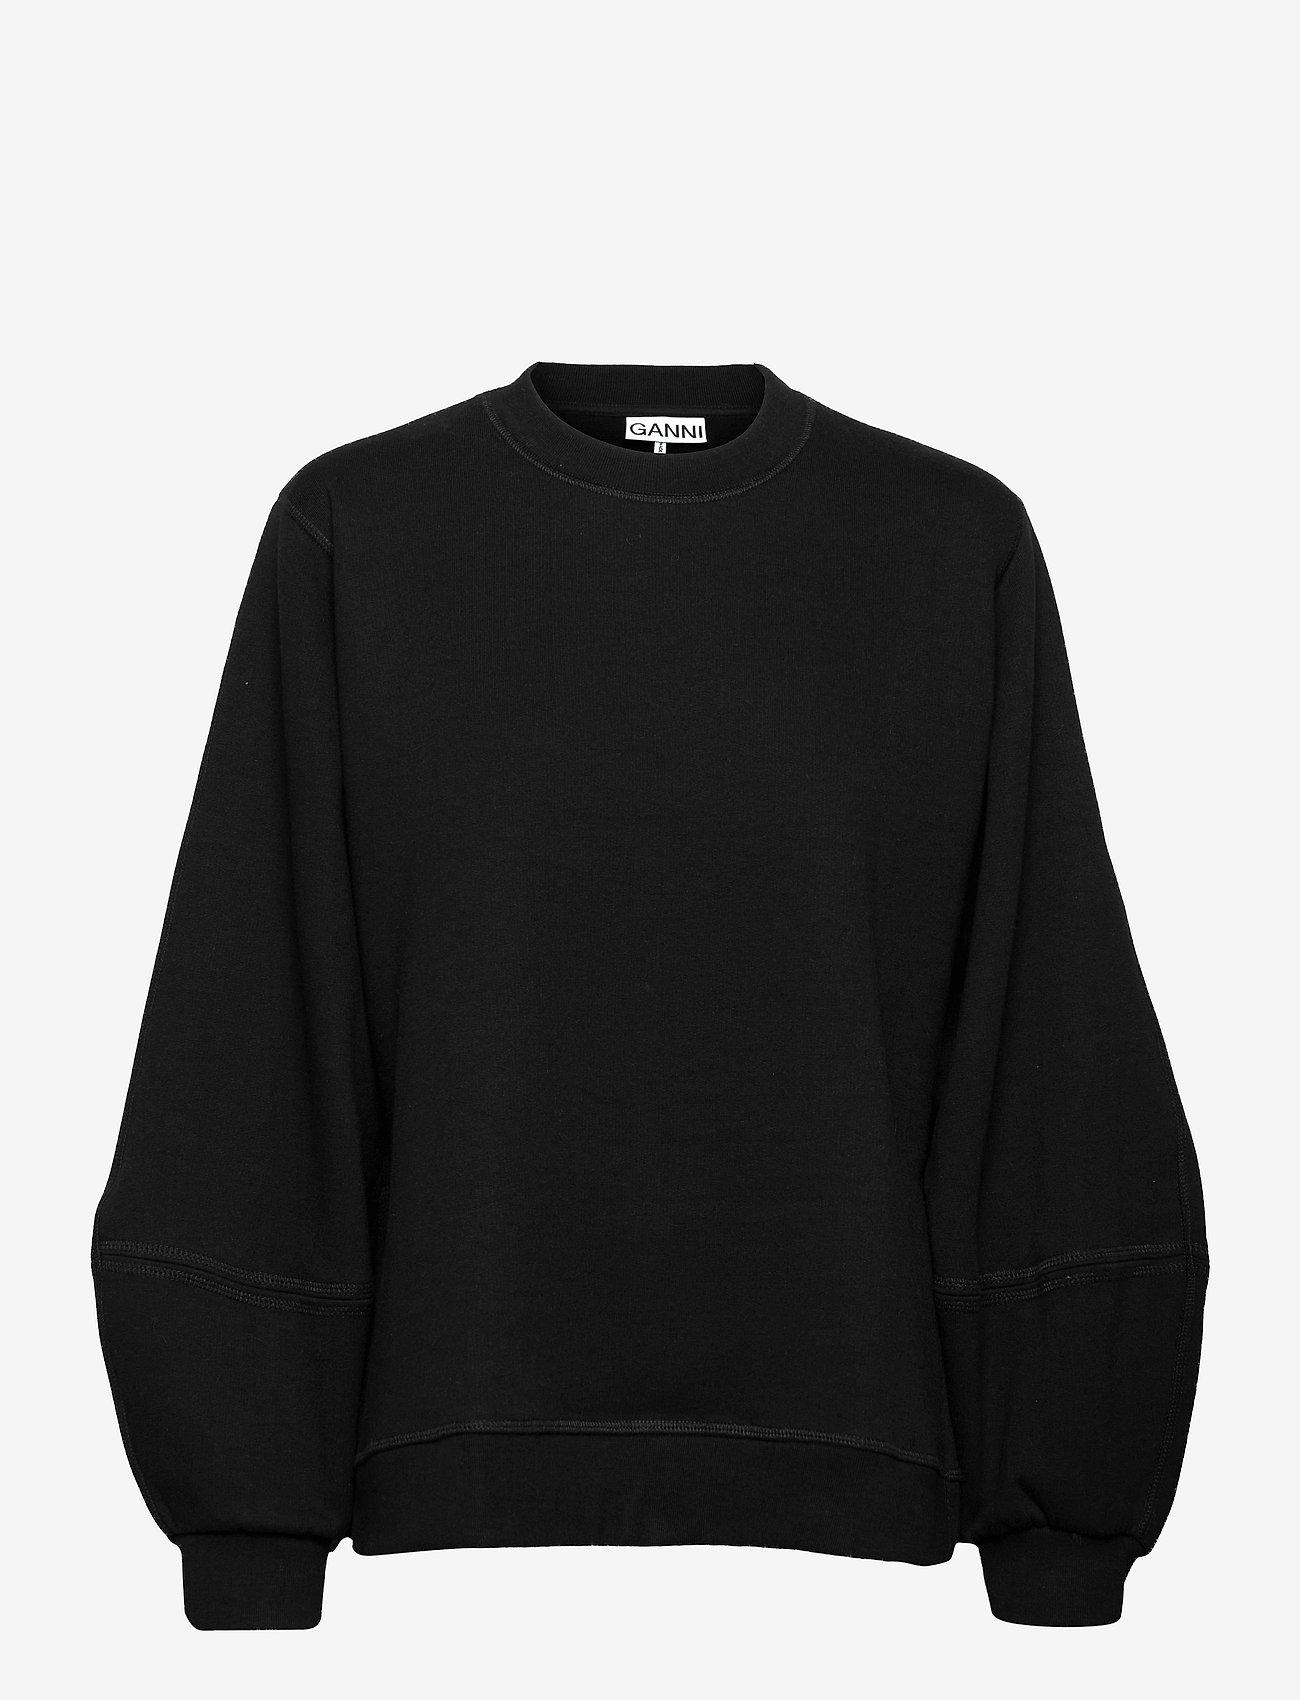 Ganni - Software Isoli - sweatshirts & hoodies - black - 0